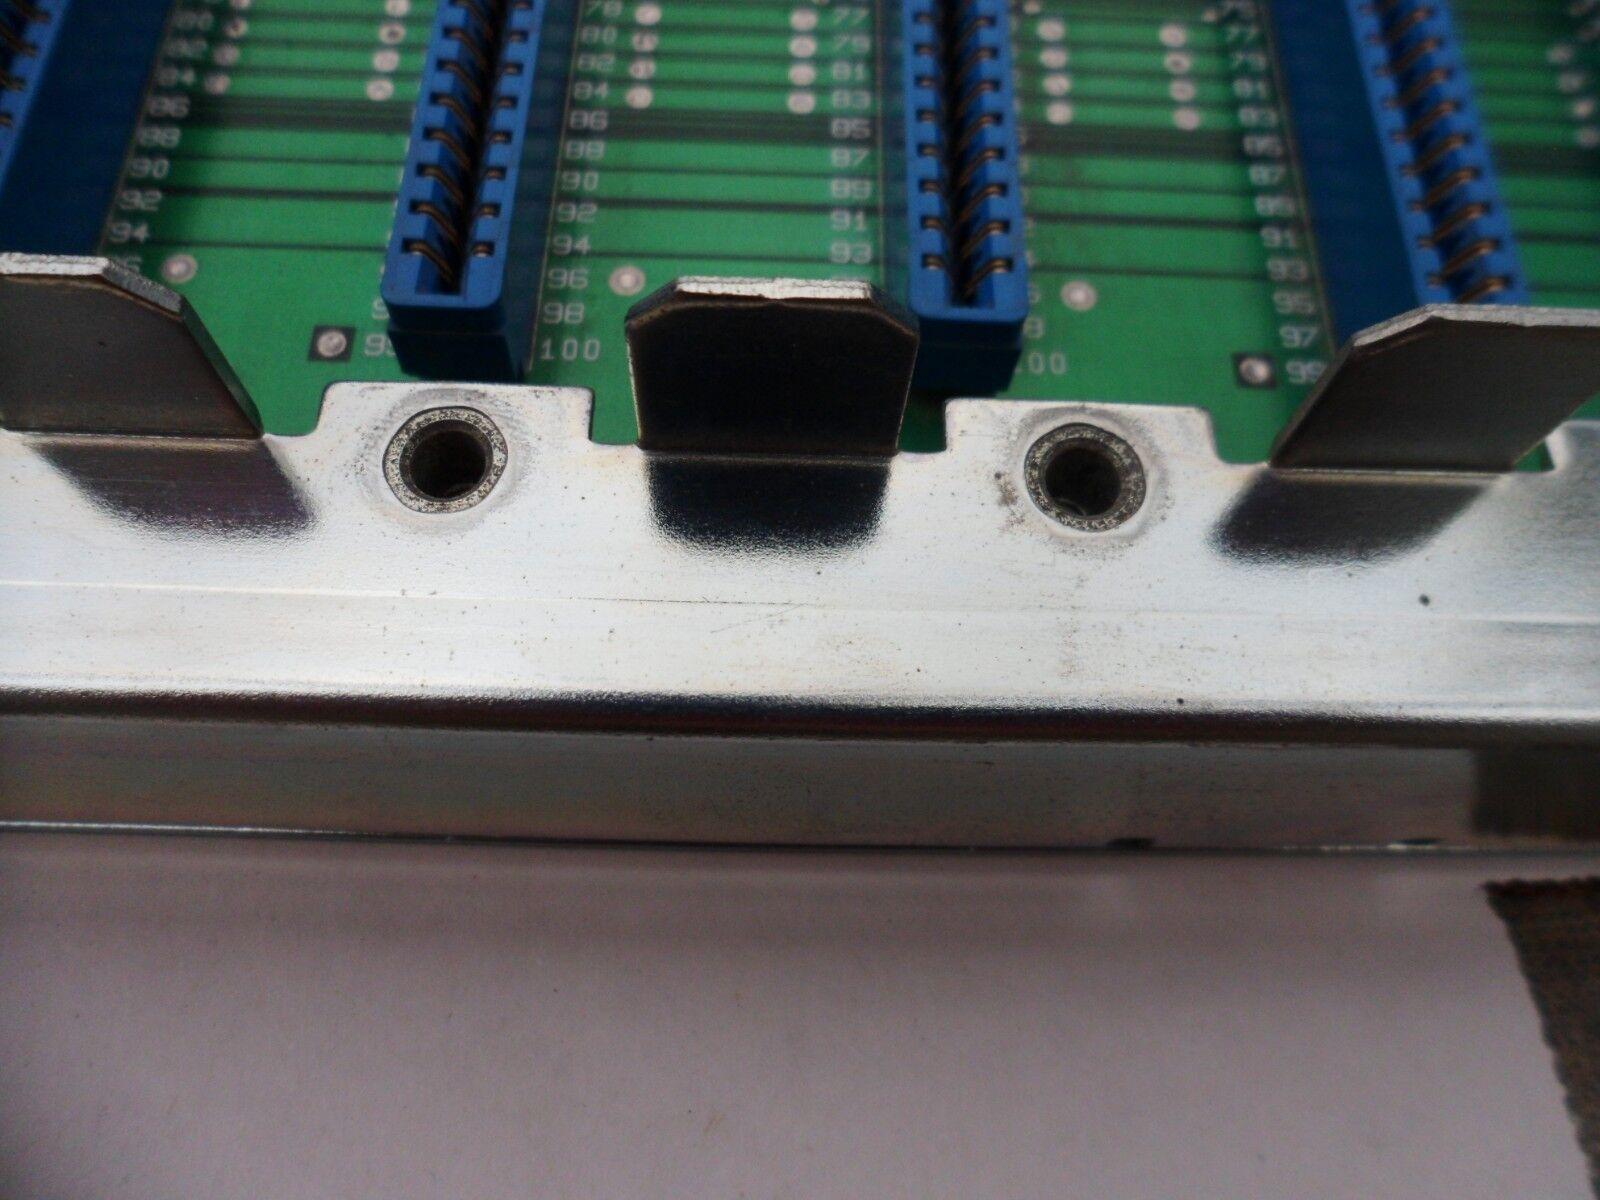 Nos 2 Square D Sy/Max 8030-RRK200 Modelo chasis 30618-500-51 serie 2 Nos RRK 200 22f602